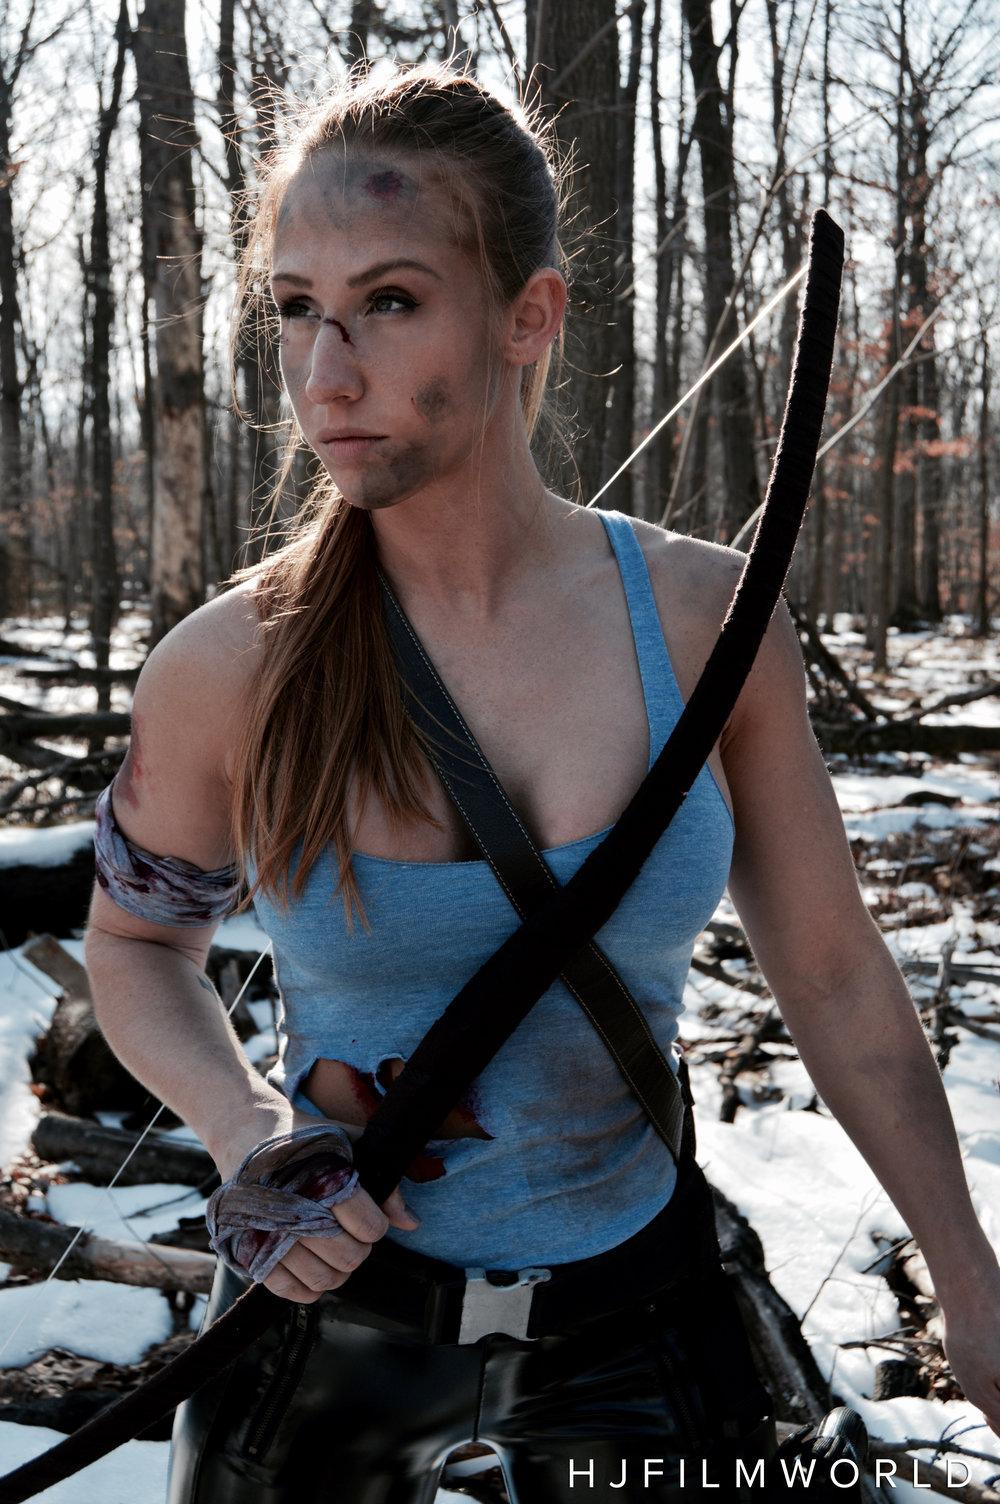 Model: Jennifer Porto